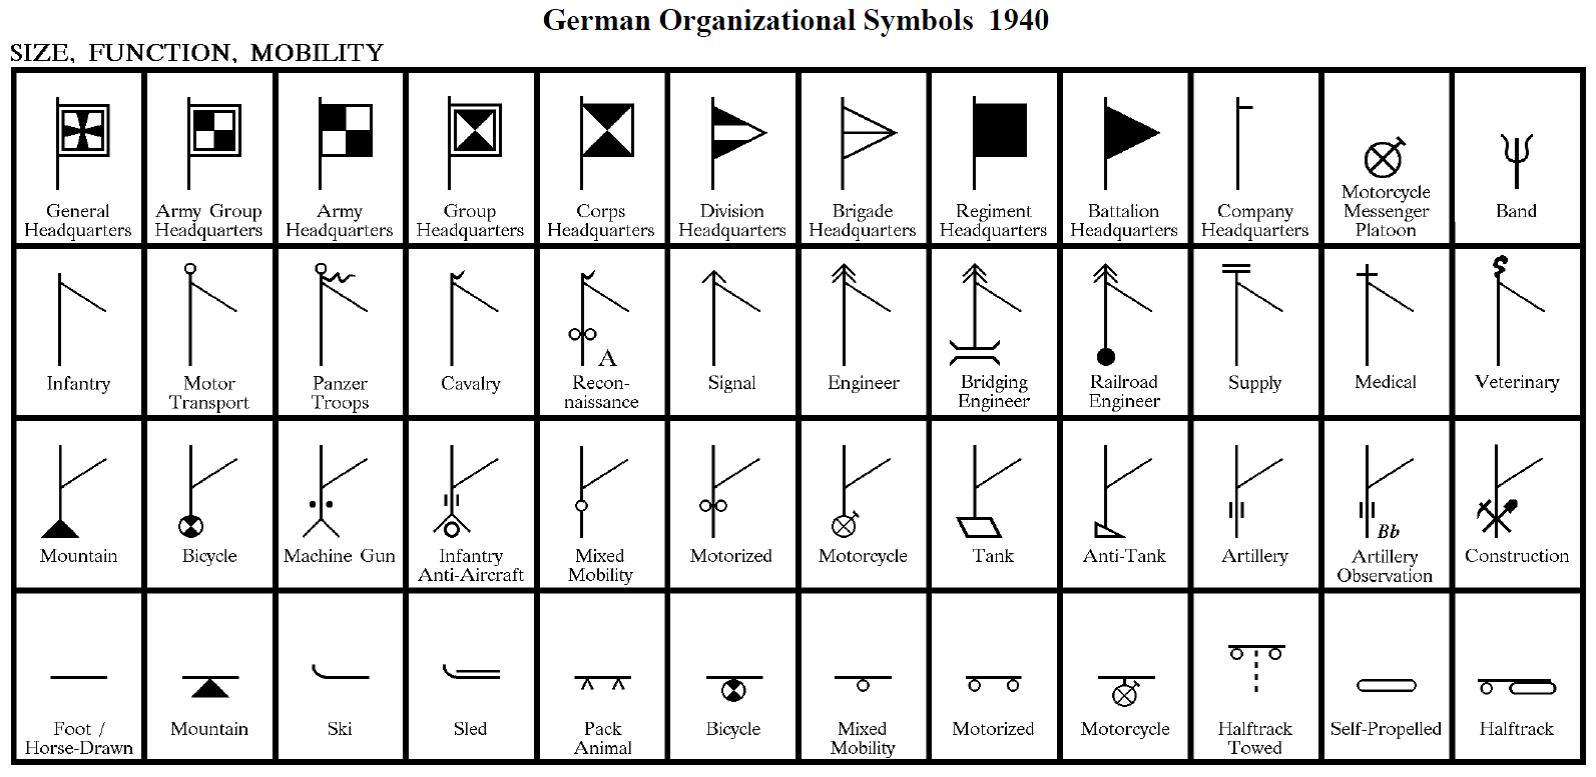 German Organizational Symbols